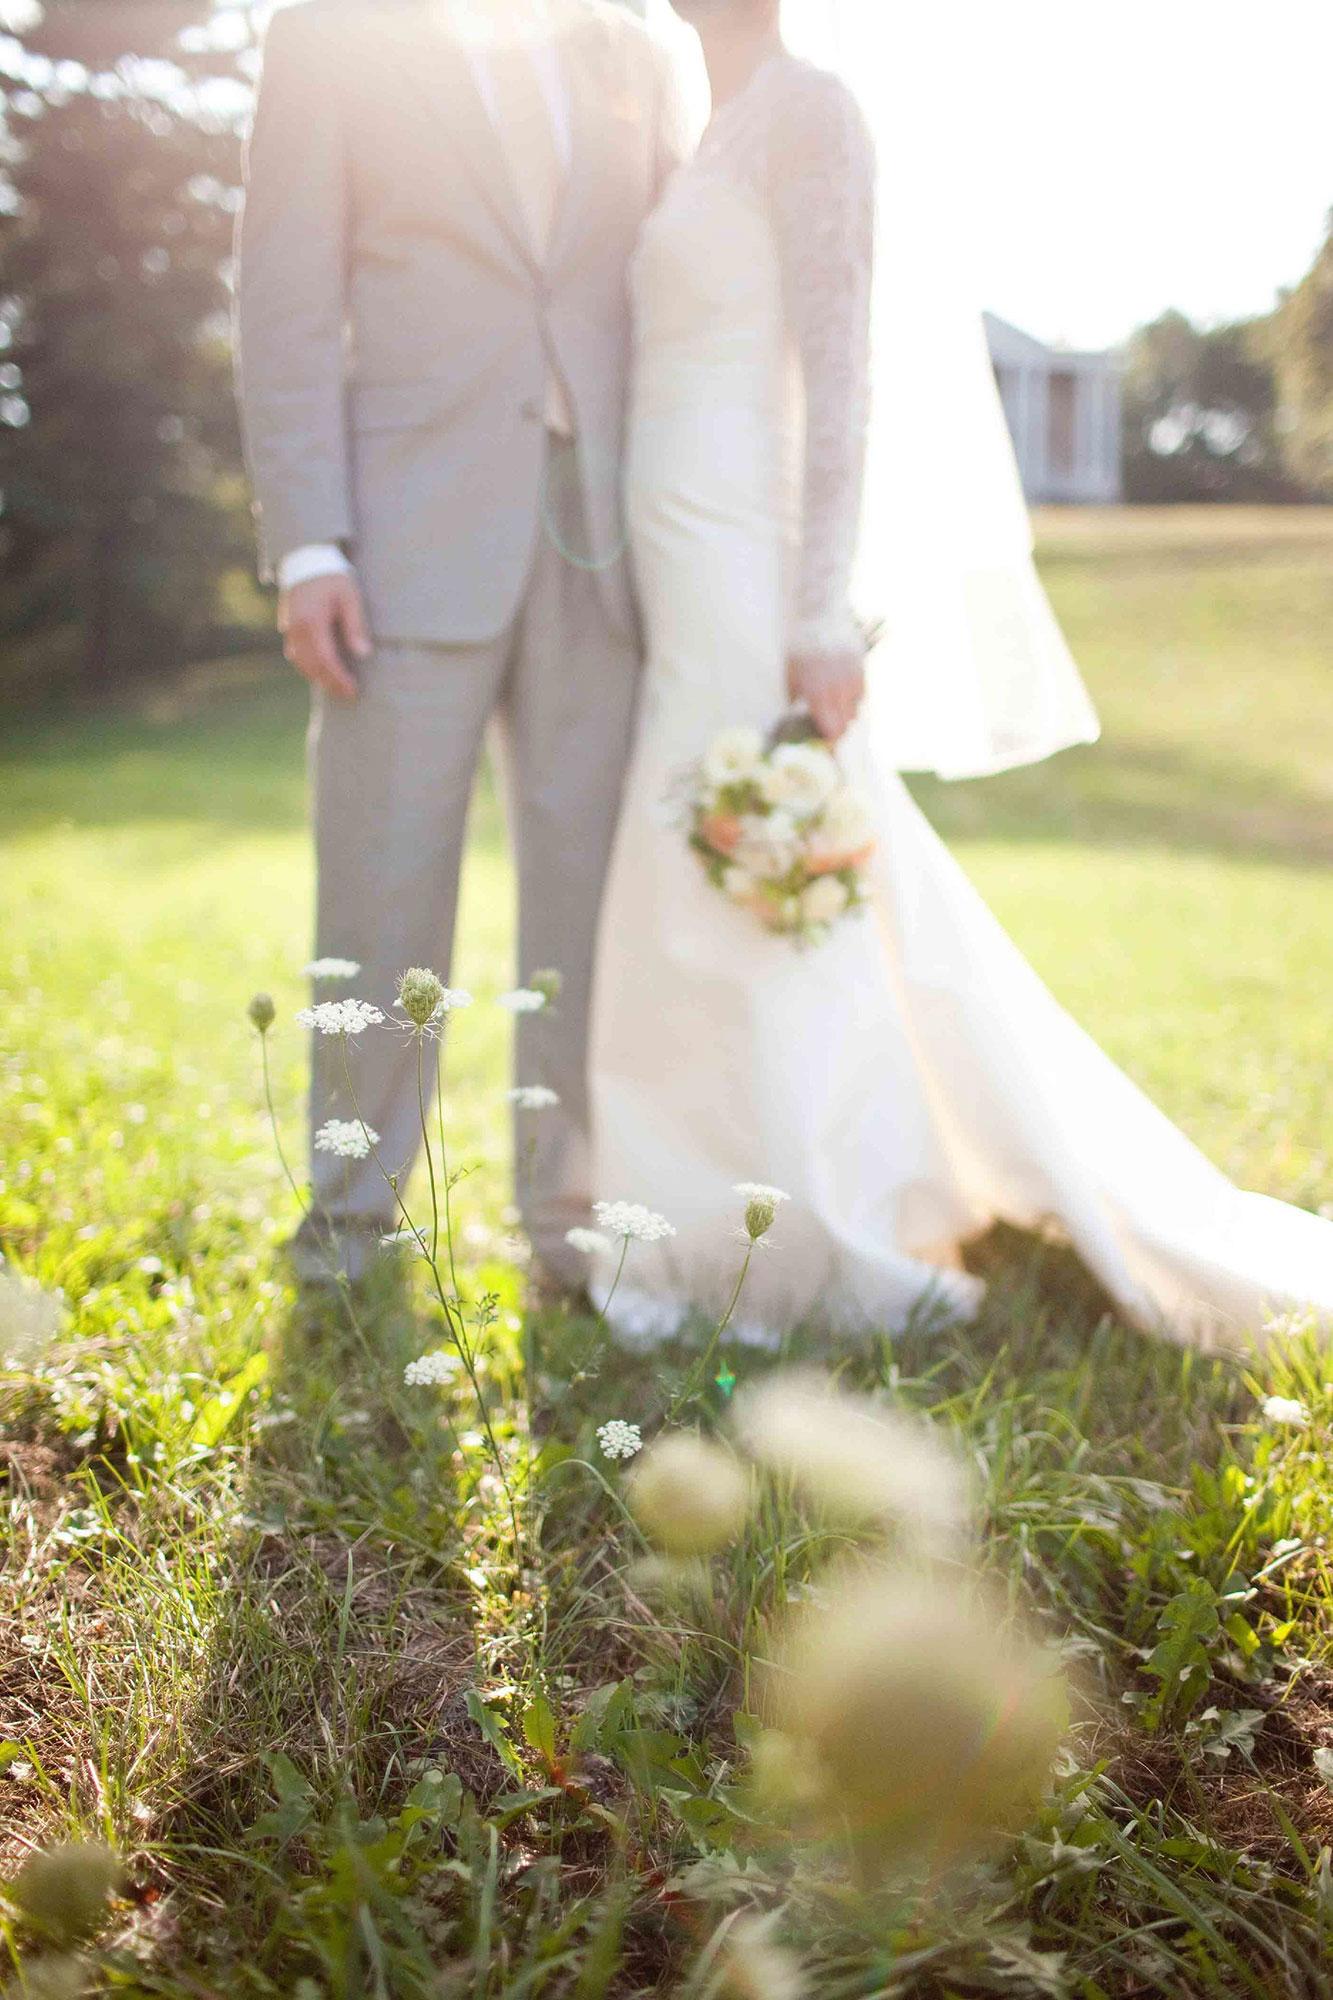 Amanda-Cowley-Willowbank-Vineyard-Bride-Photo-By-White-Photographie-035.jpg